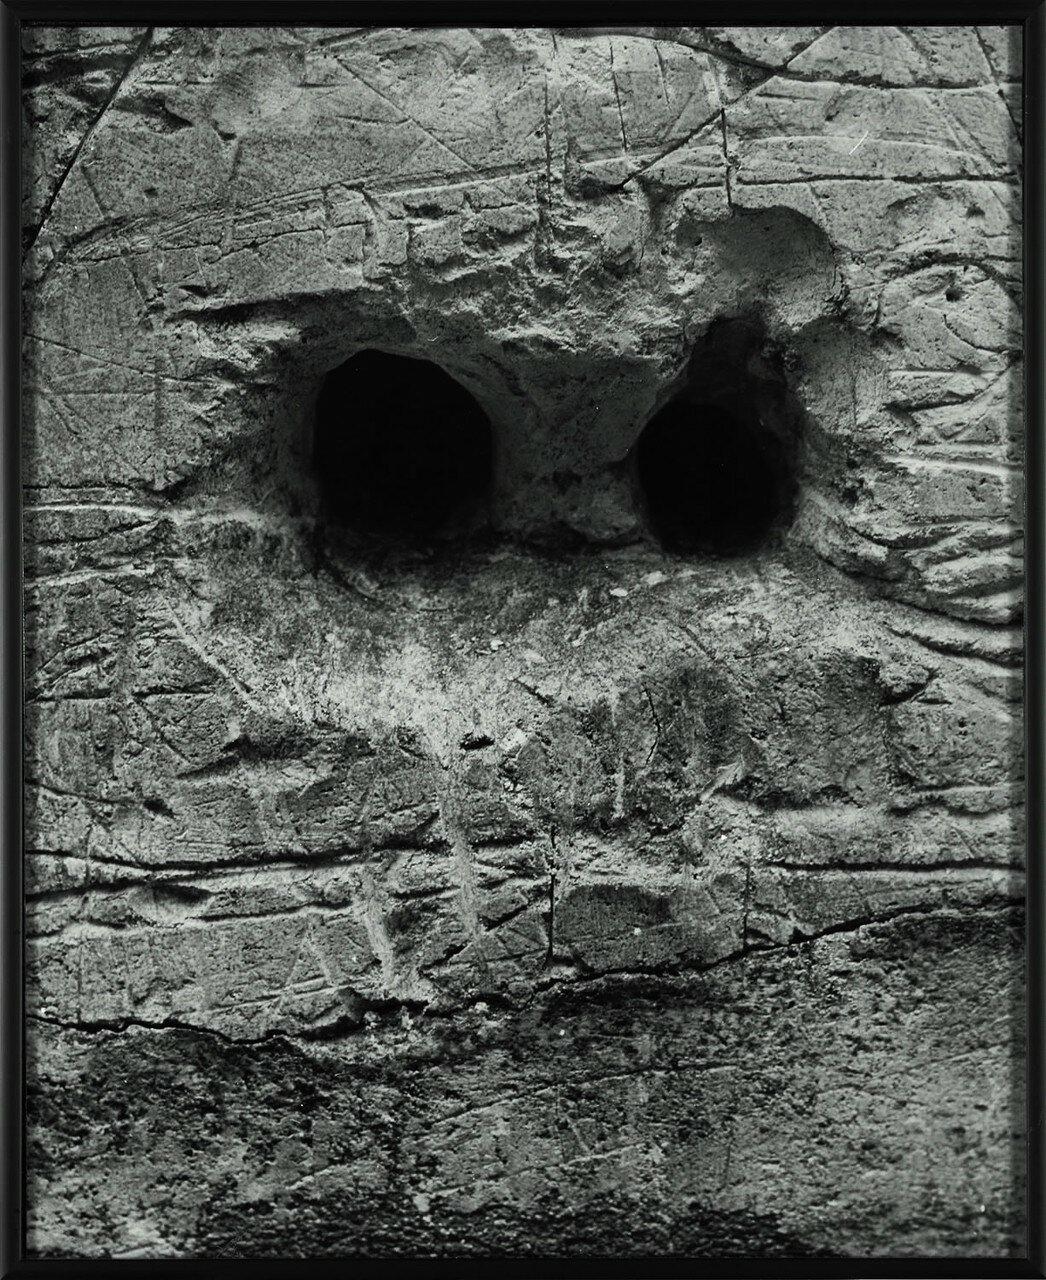 1930. Граффити. Серия III Рождение лица. Без названия